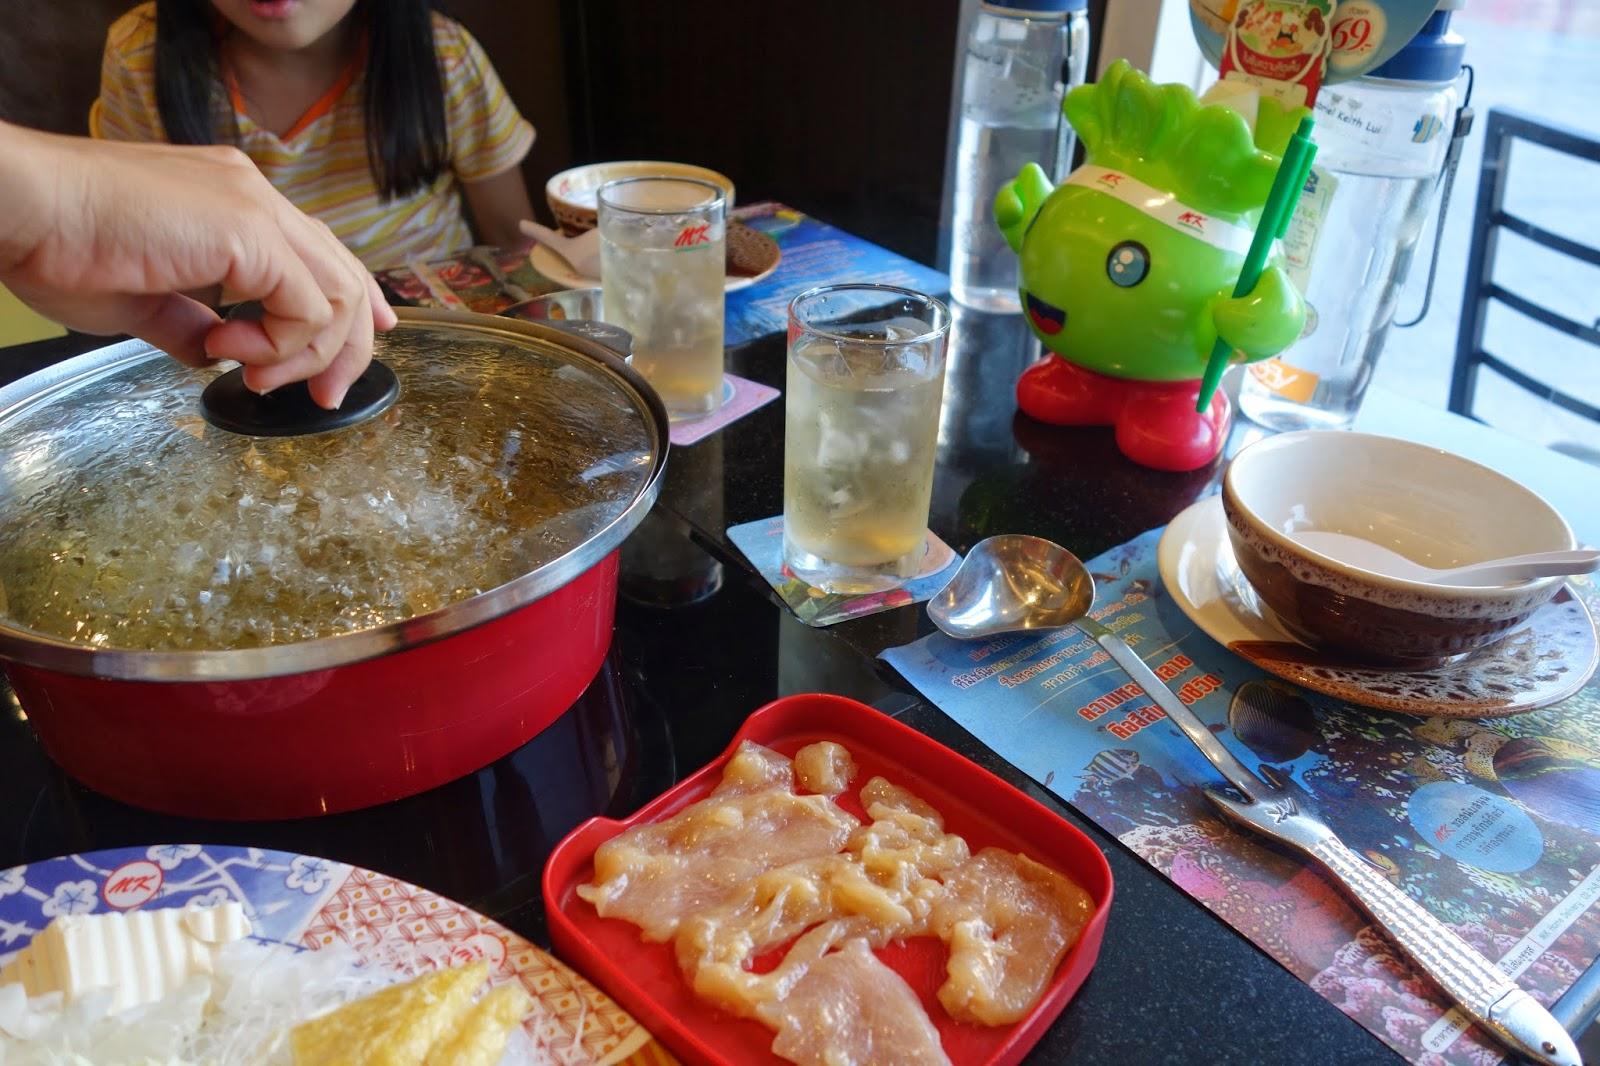 Fast Food Restuarants That Do Not Serve Pork